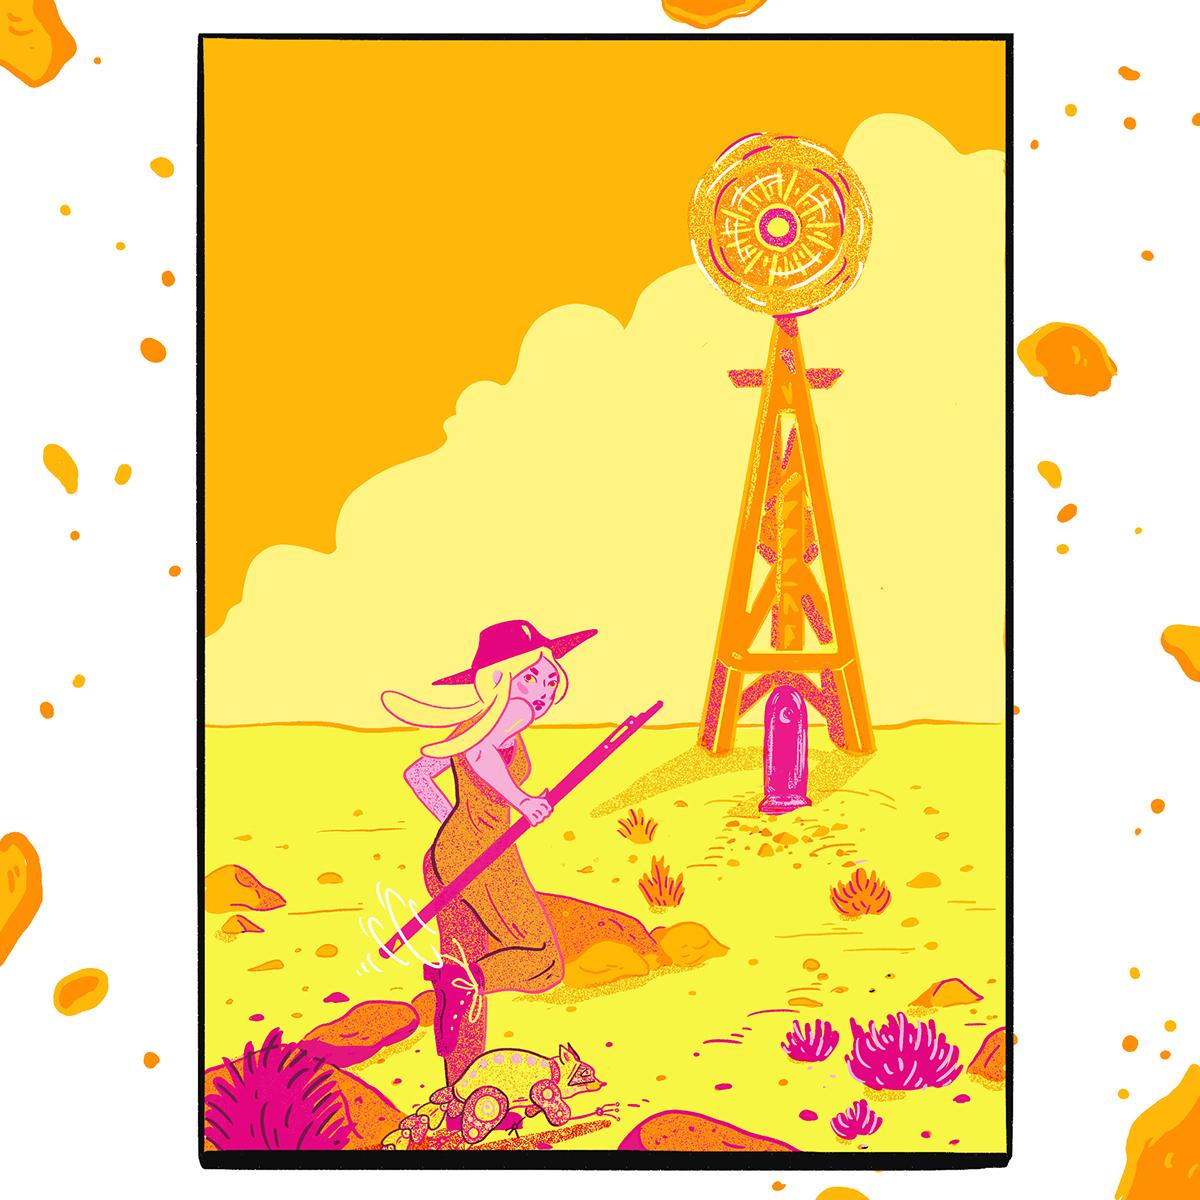 comic fugitive Runaway western ILLUSTRATION  neon wild west pink Character design  Storyboards